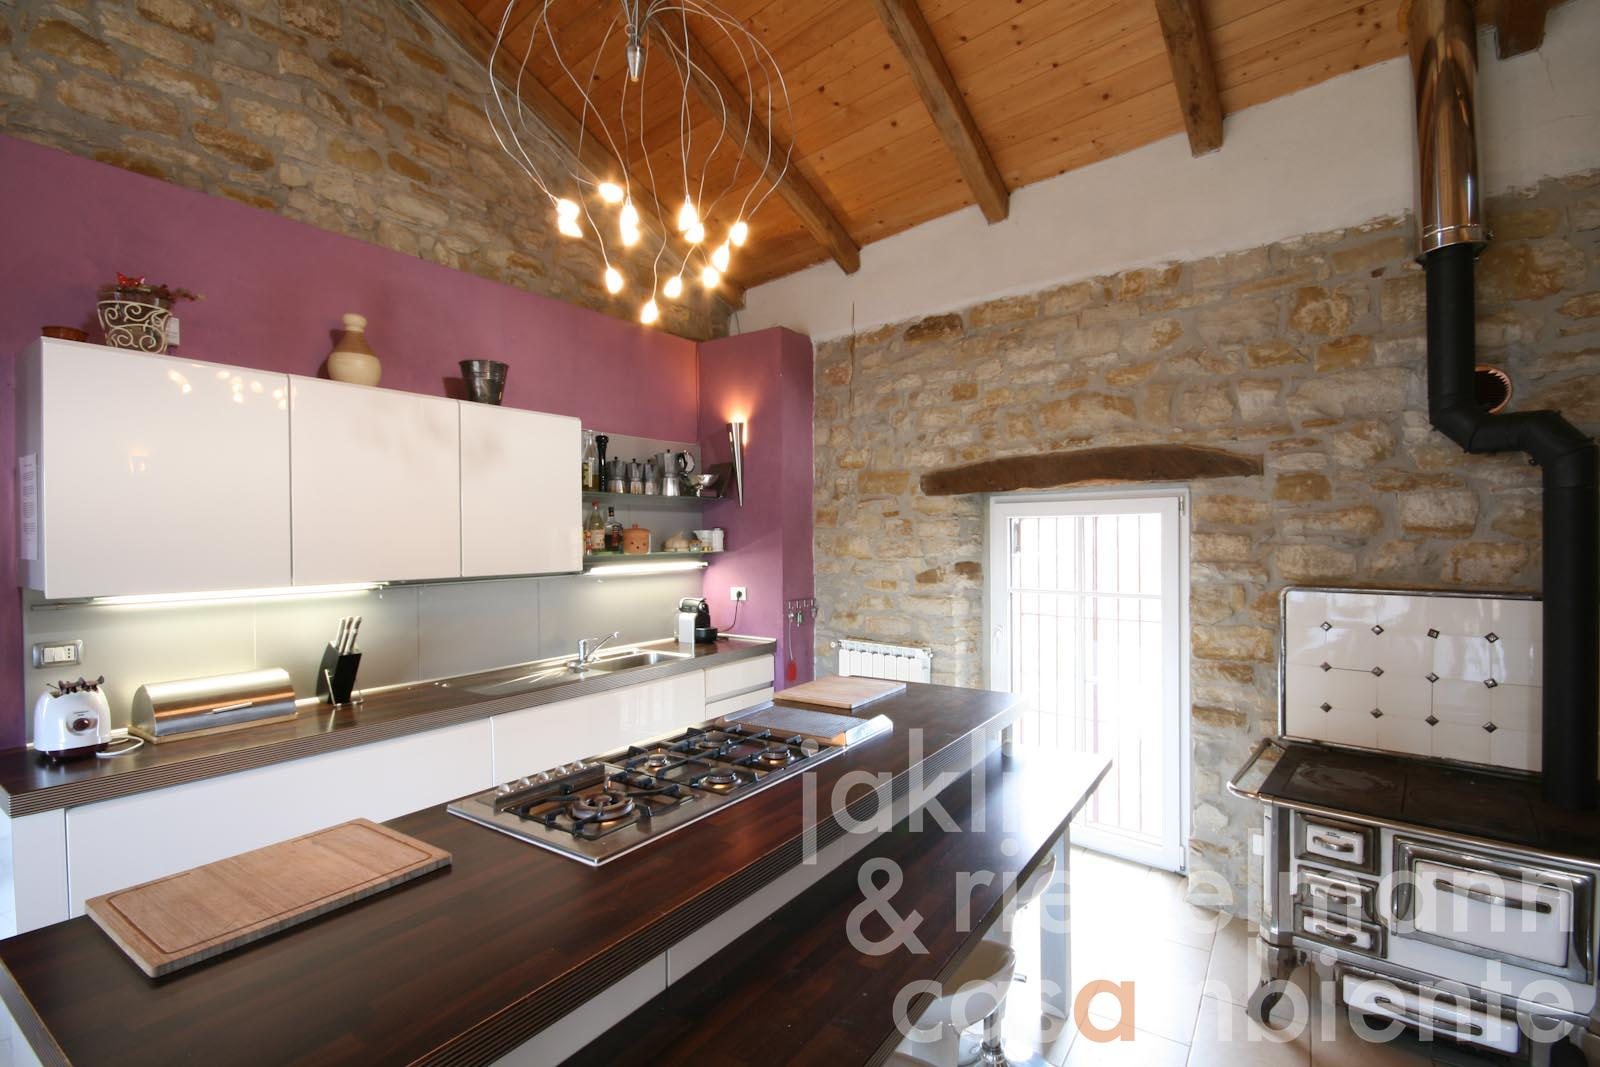 Cielo terra in vendita in italia piemonte asti casale - Cucina abitabile ...